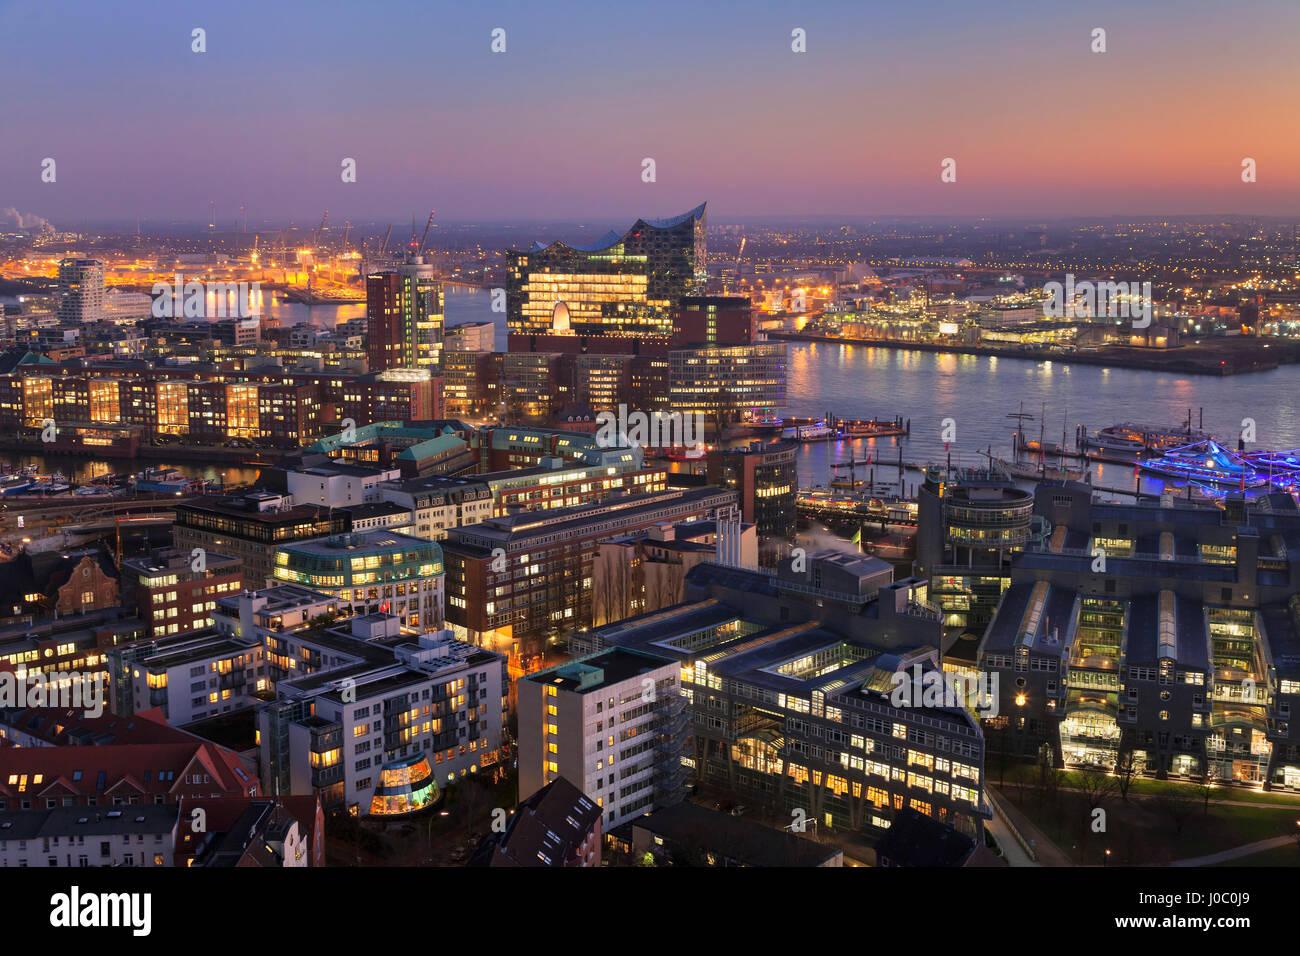 View over HafenCity and Elbphilharmonie at sunset, Hamburg, Hanseatic City, Germany - Stock Image